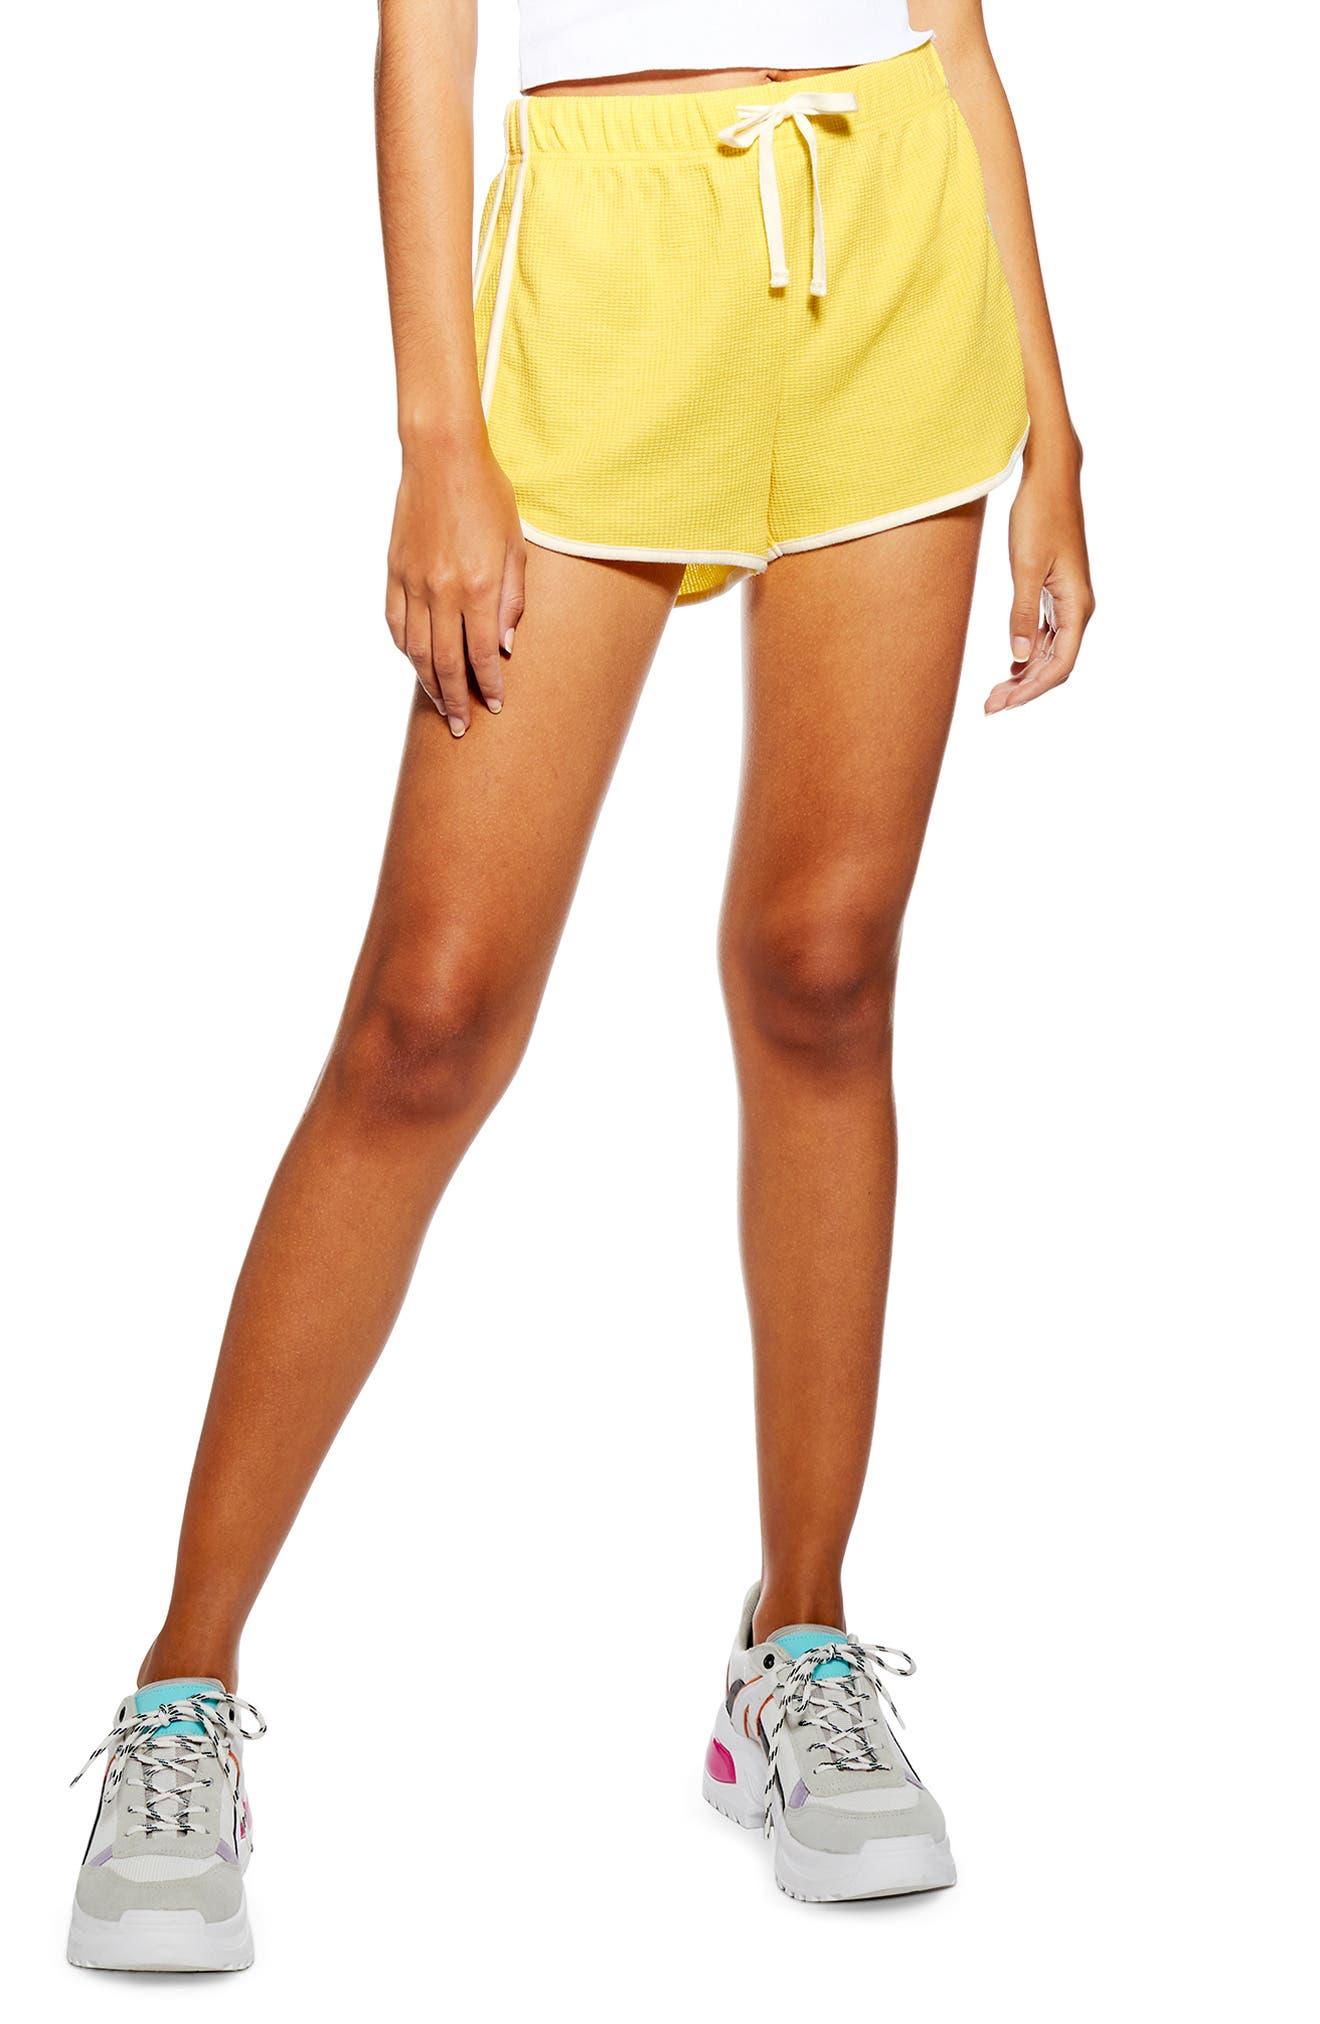 Vintage High Waisted Shorts, Sailor Shorts, Capris Womens Topshop Waffle Runner Shorts $18.00 AT vintagedancer.com